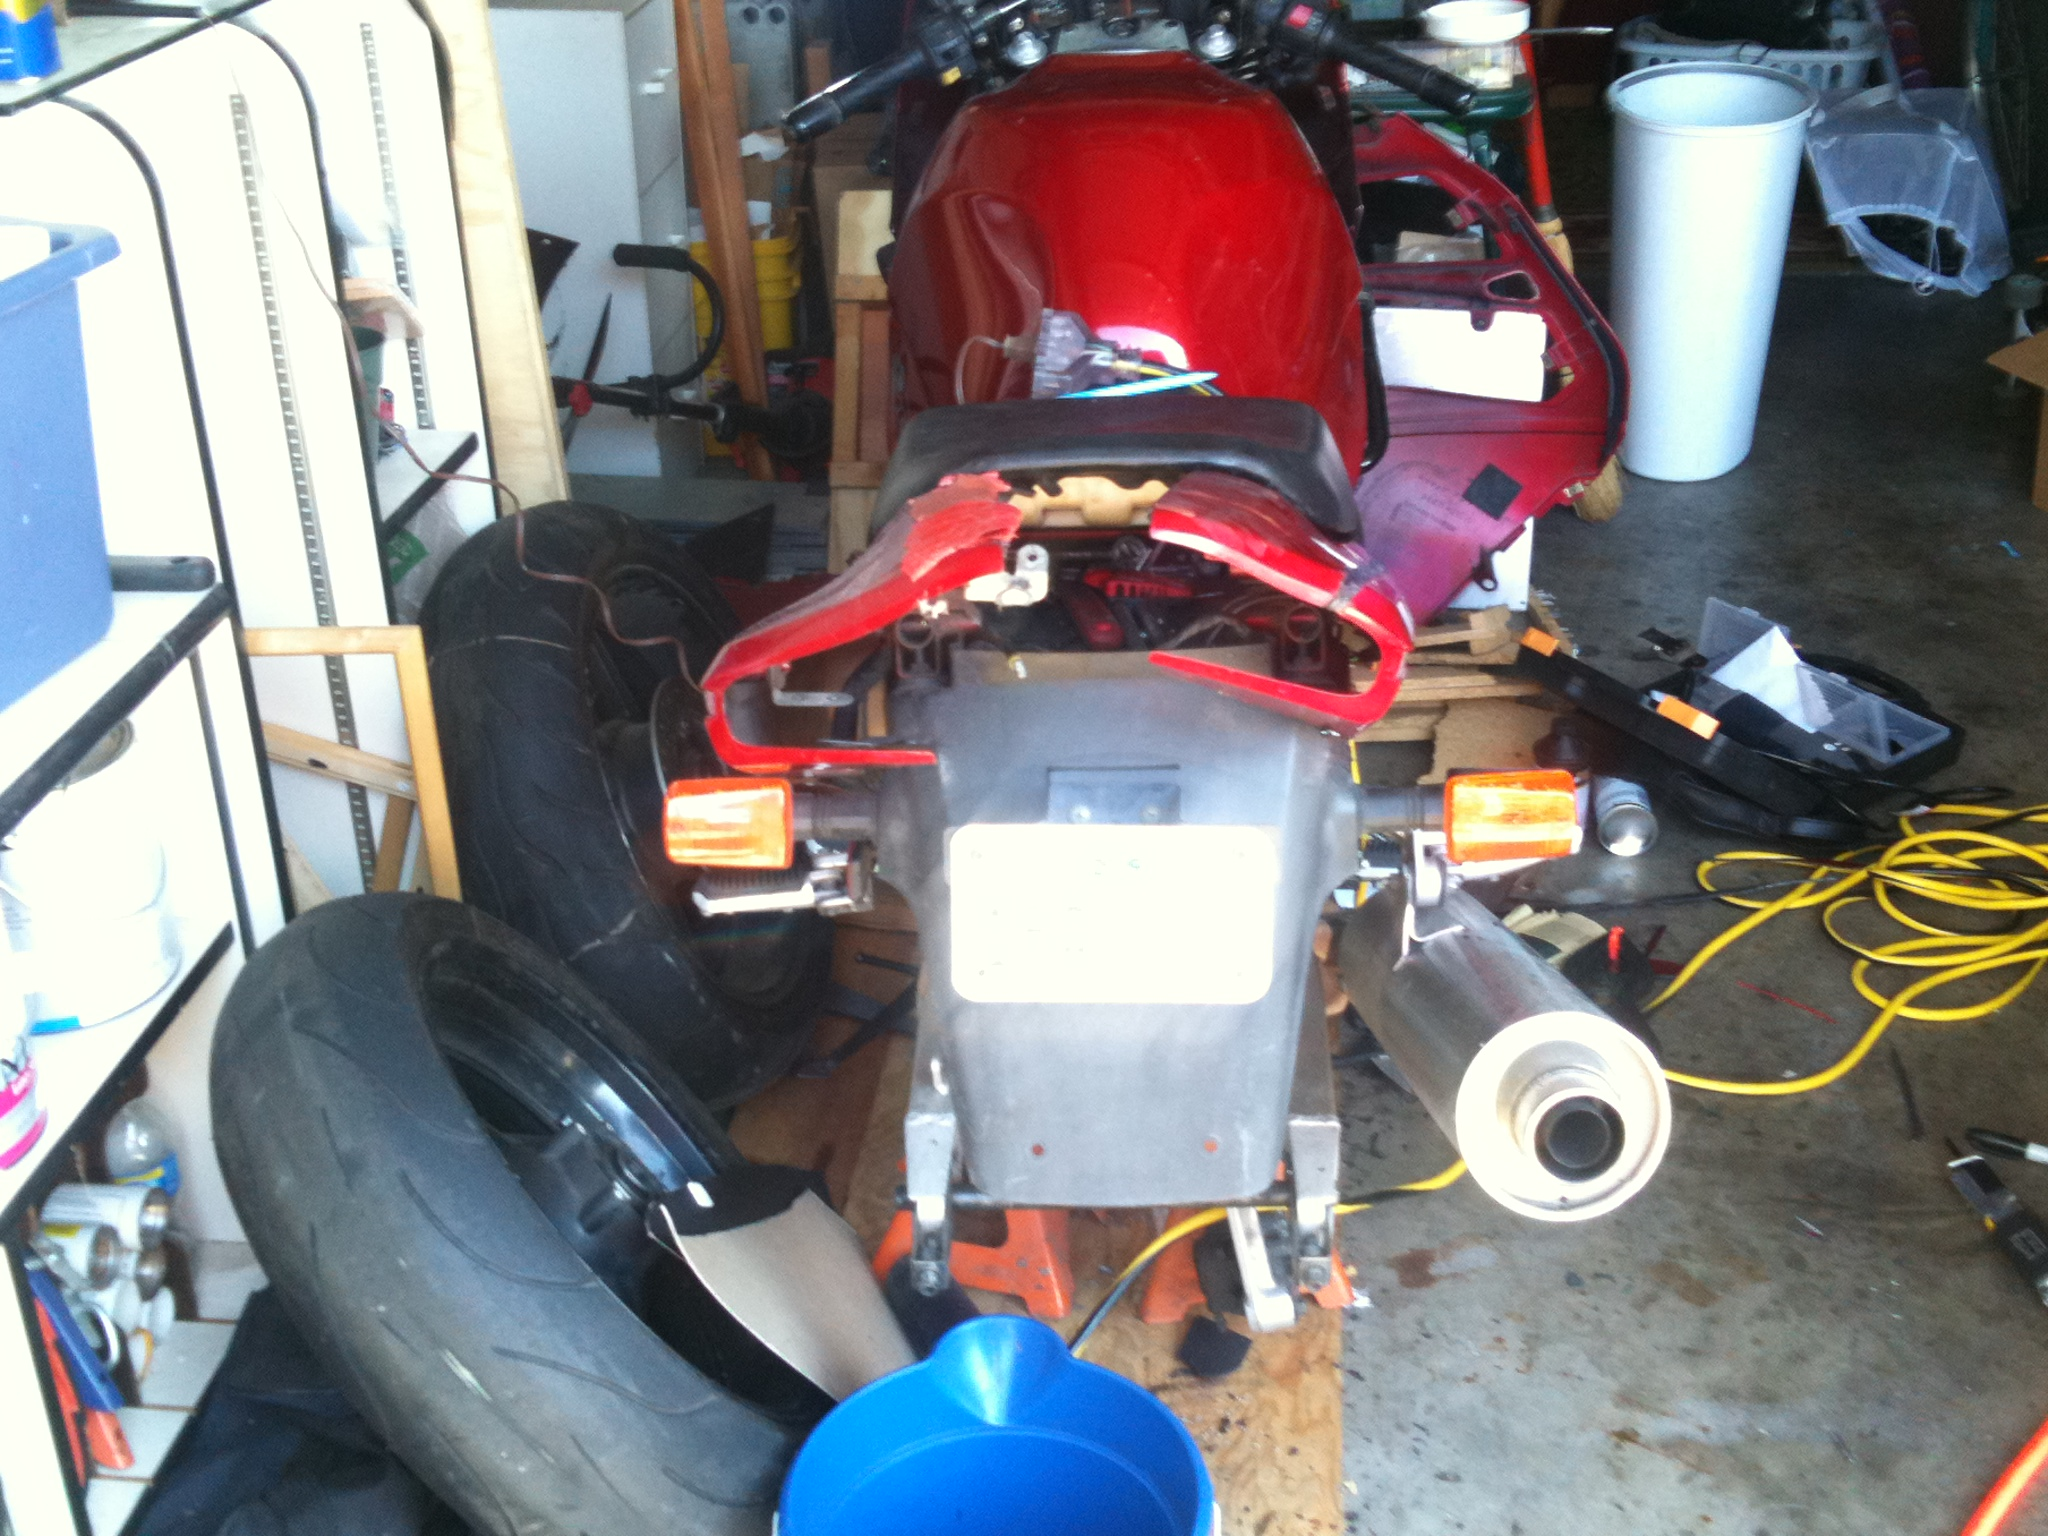 My RF900R! - Sportbikes.net